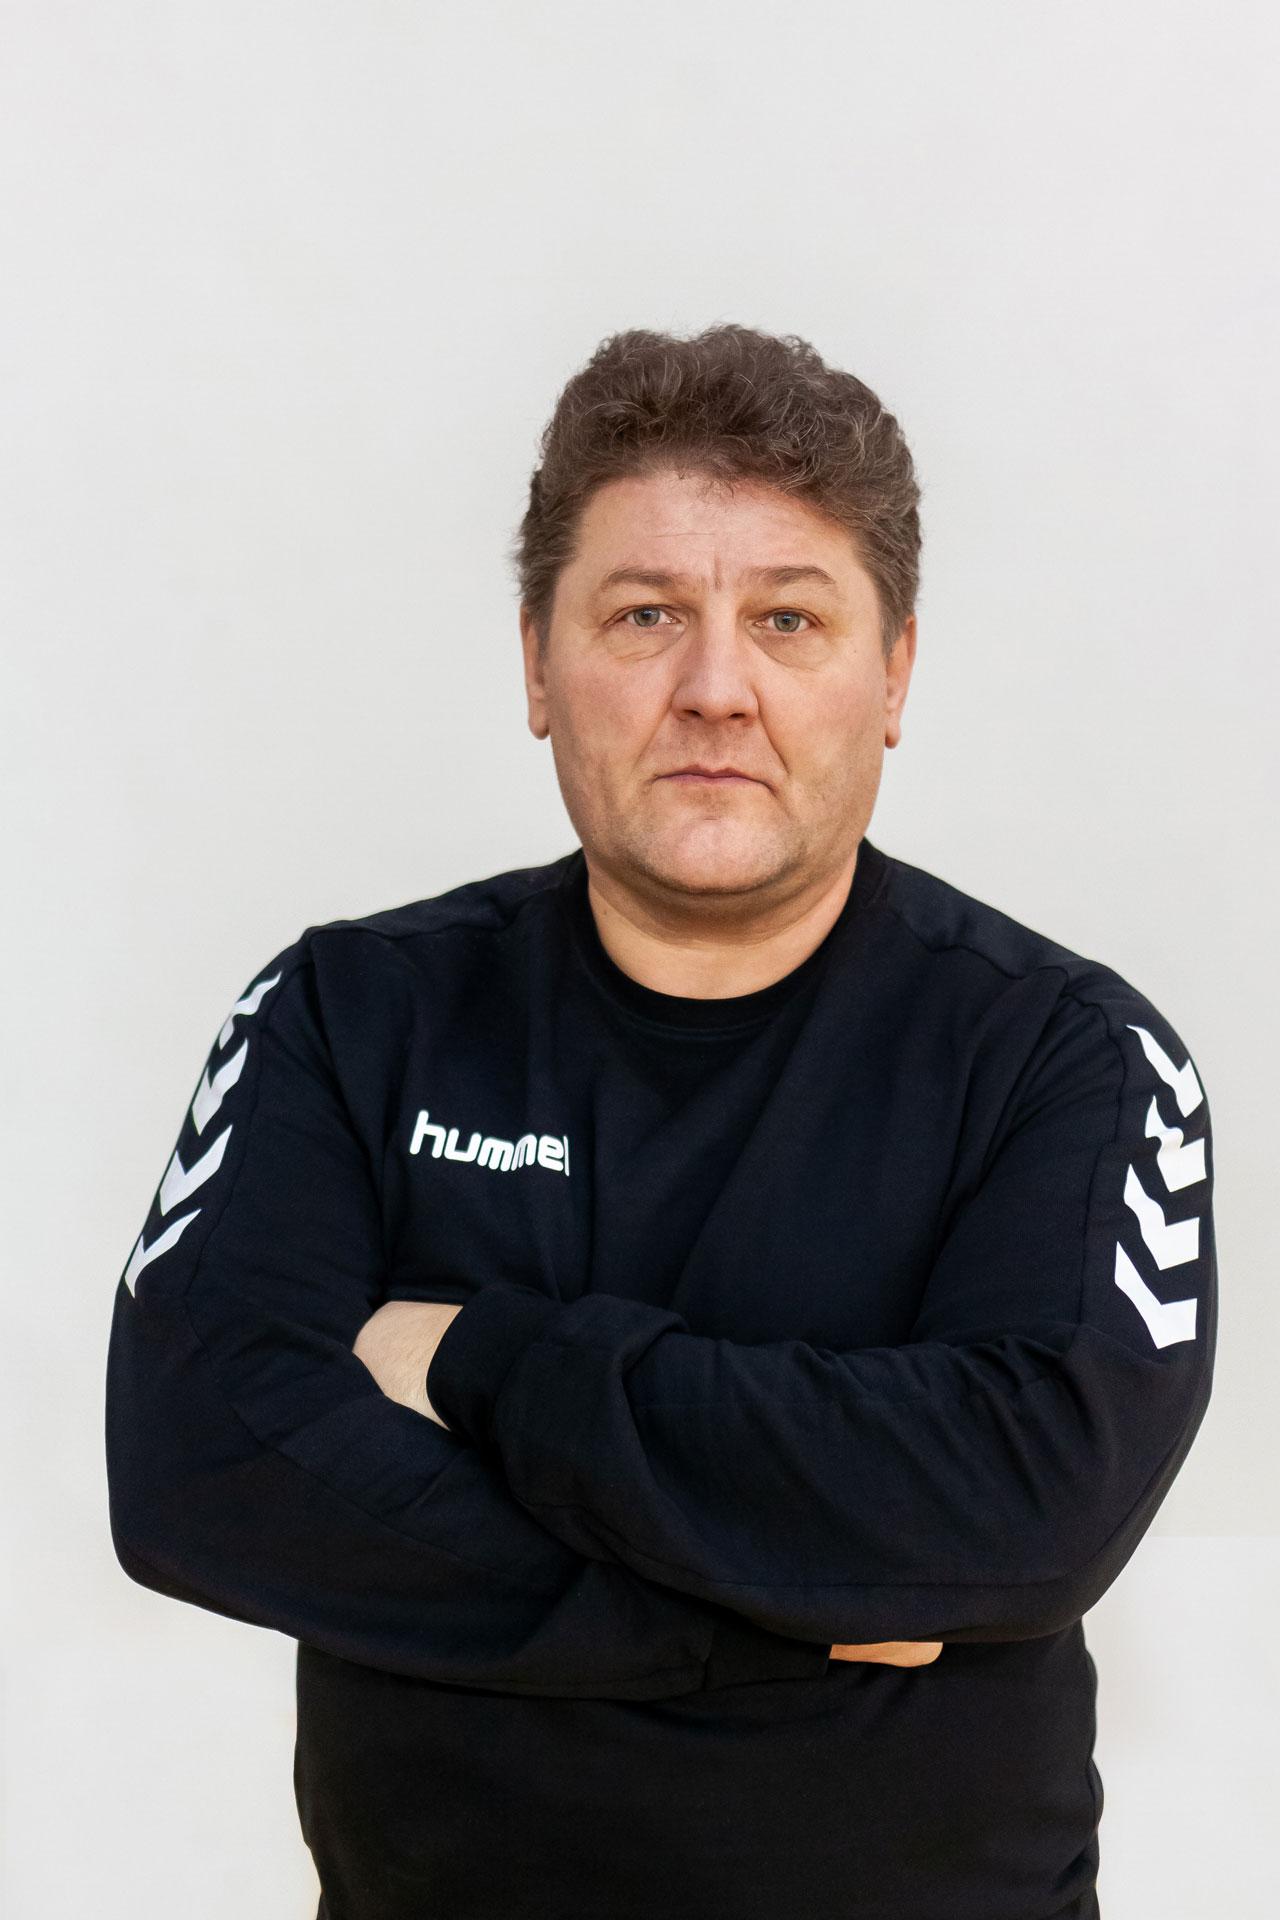 Витебчанка Тимошин Игорь